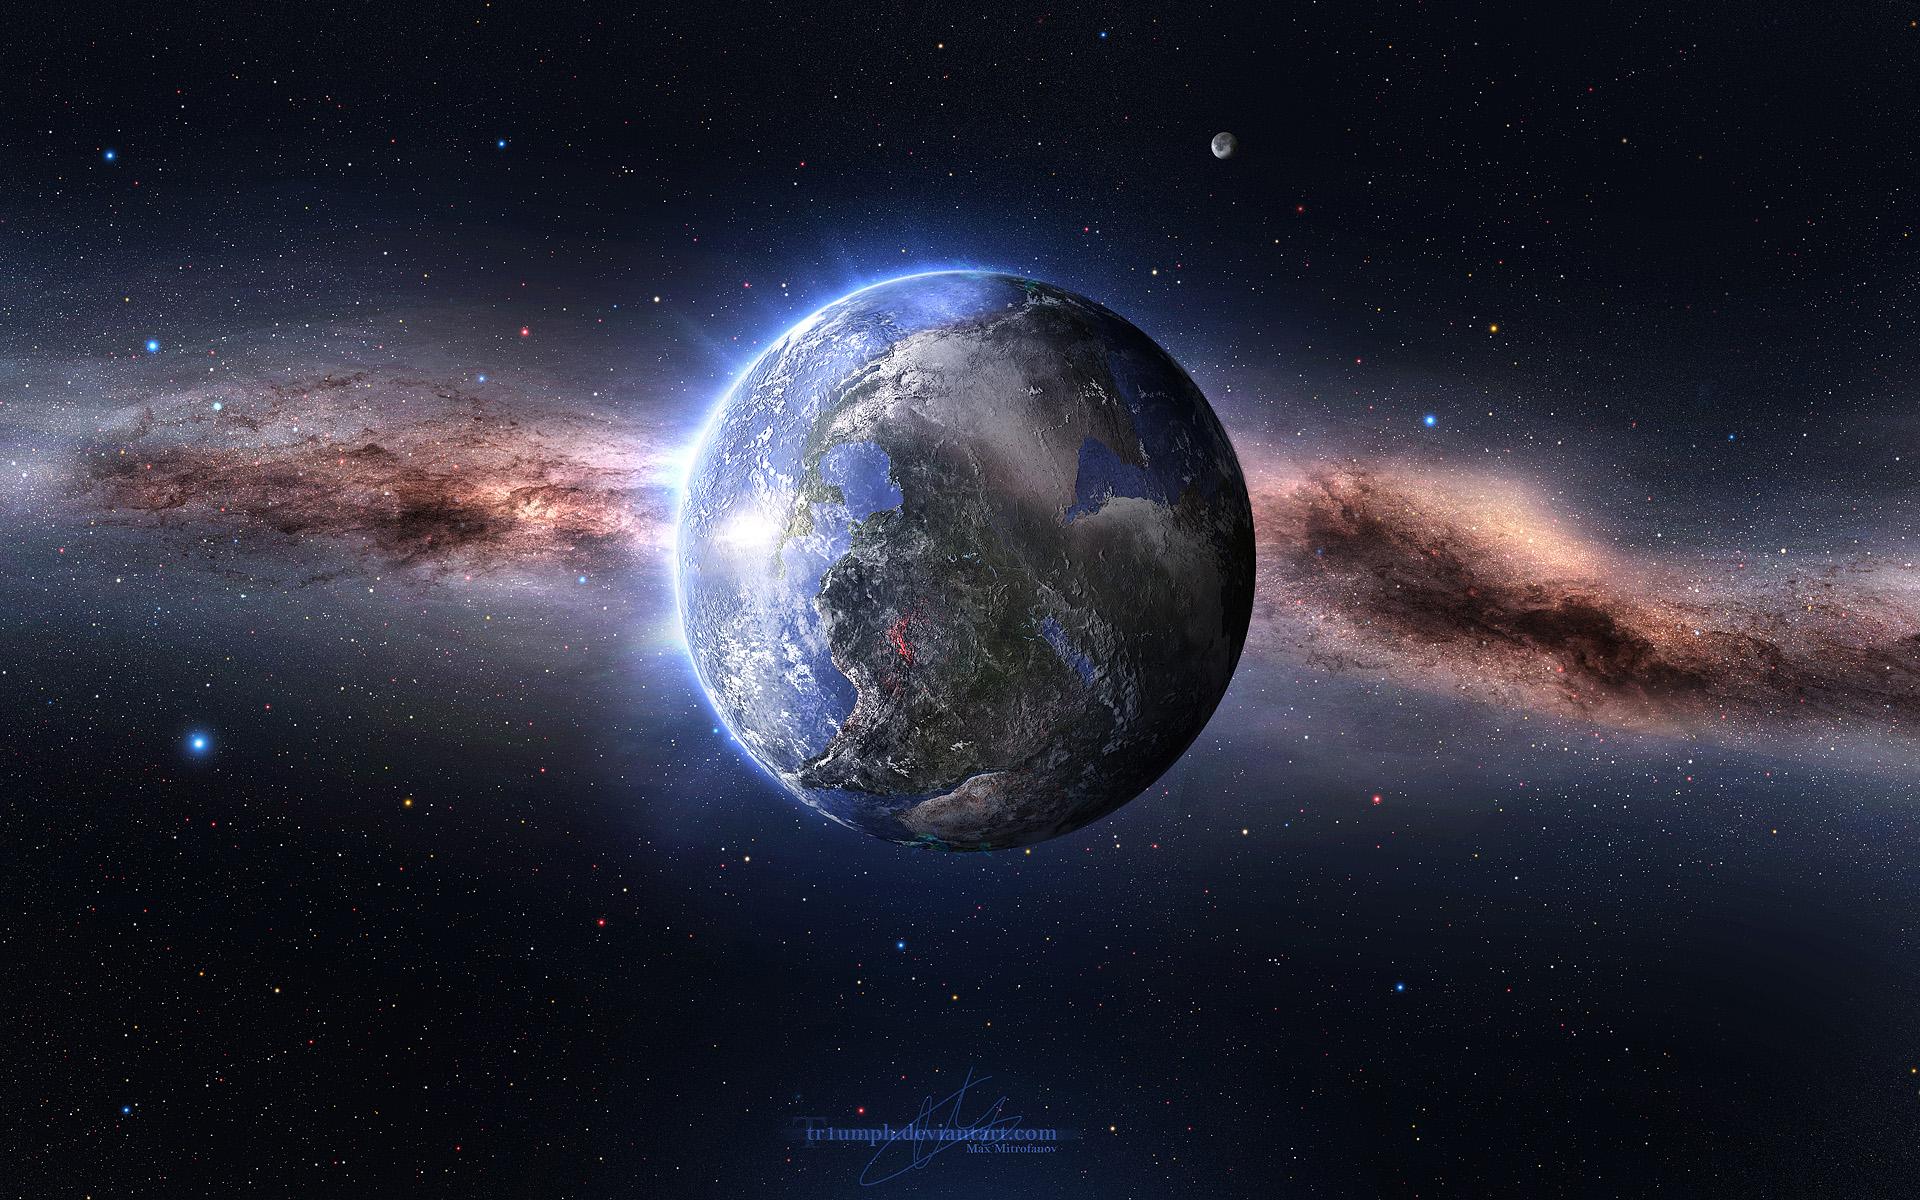 earth from space wallpaper hd - wallpapersafari